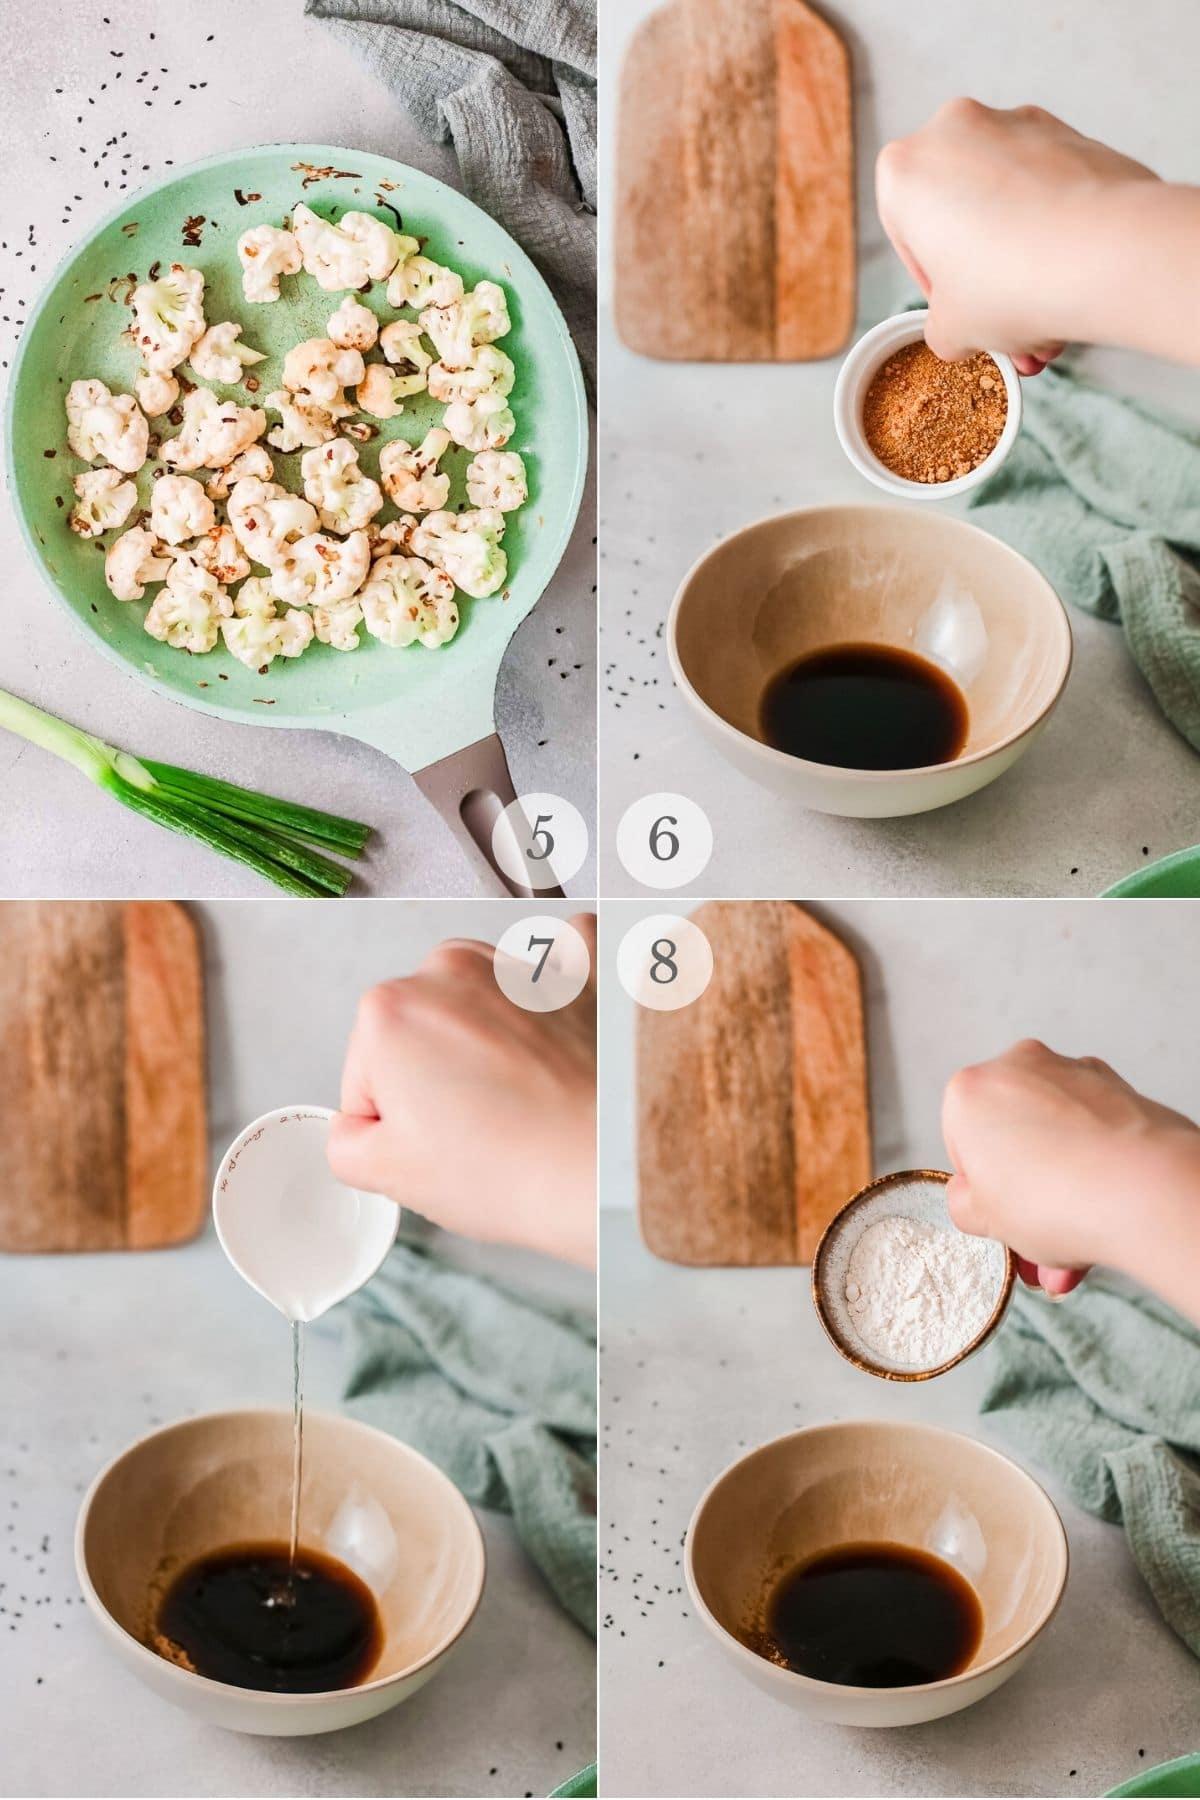 korean bbq cauliflower recipe steps 5-8